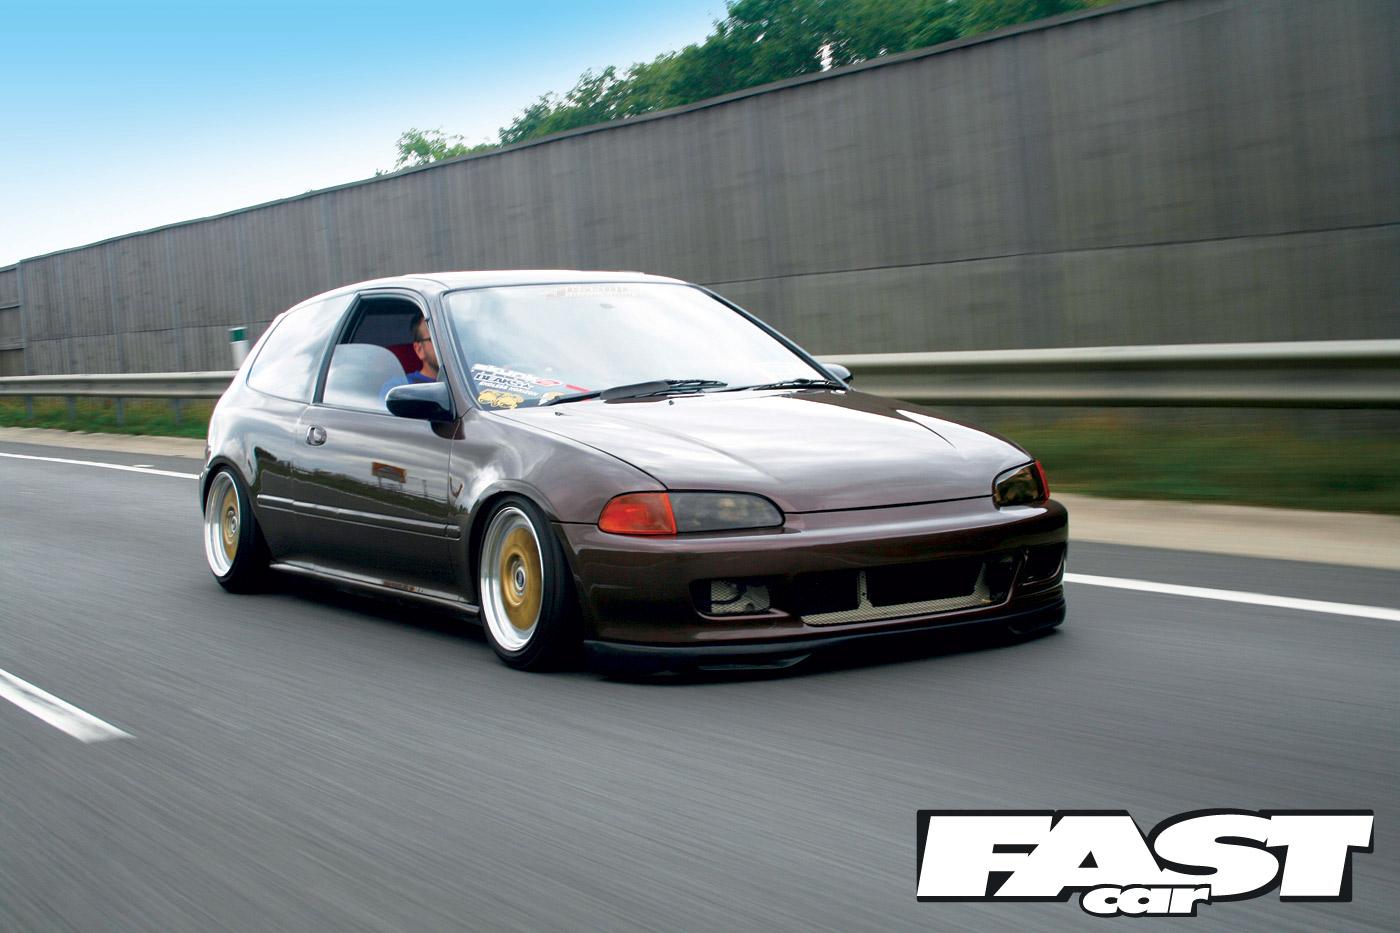 Fast Car Wallpapers Fast Car 1400x933